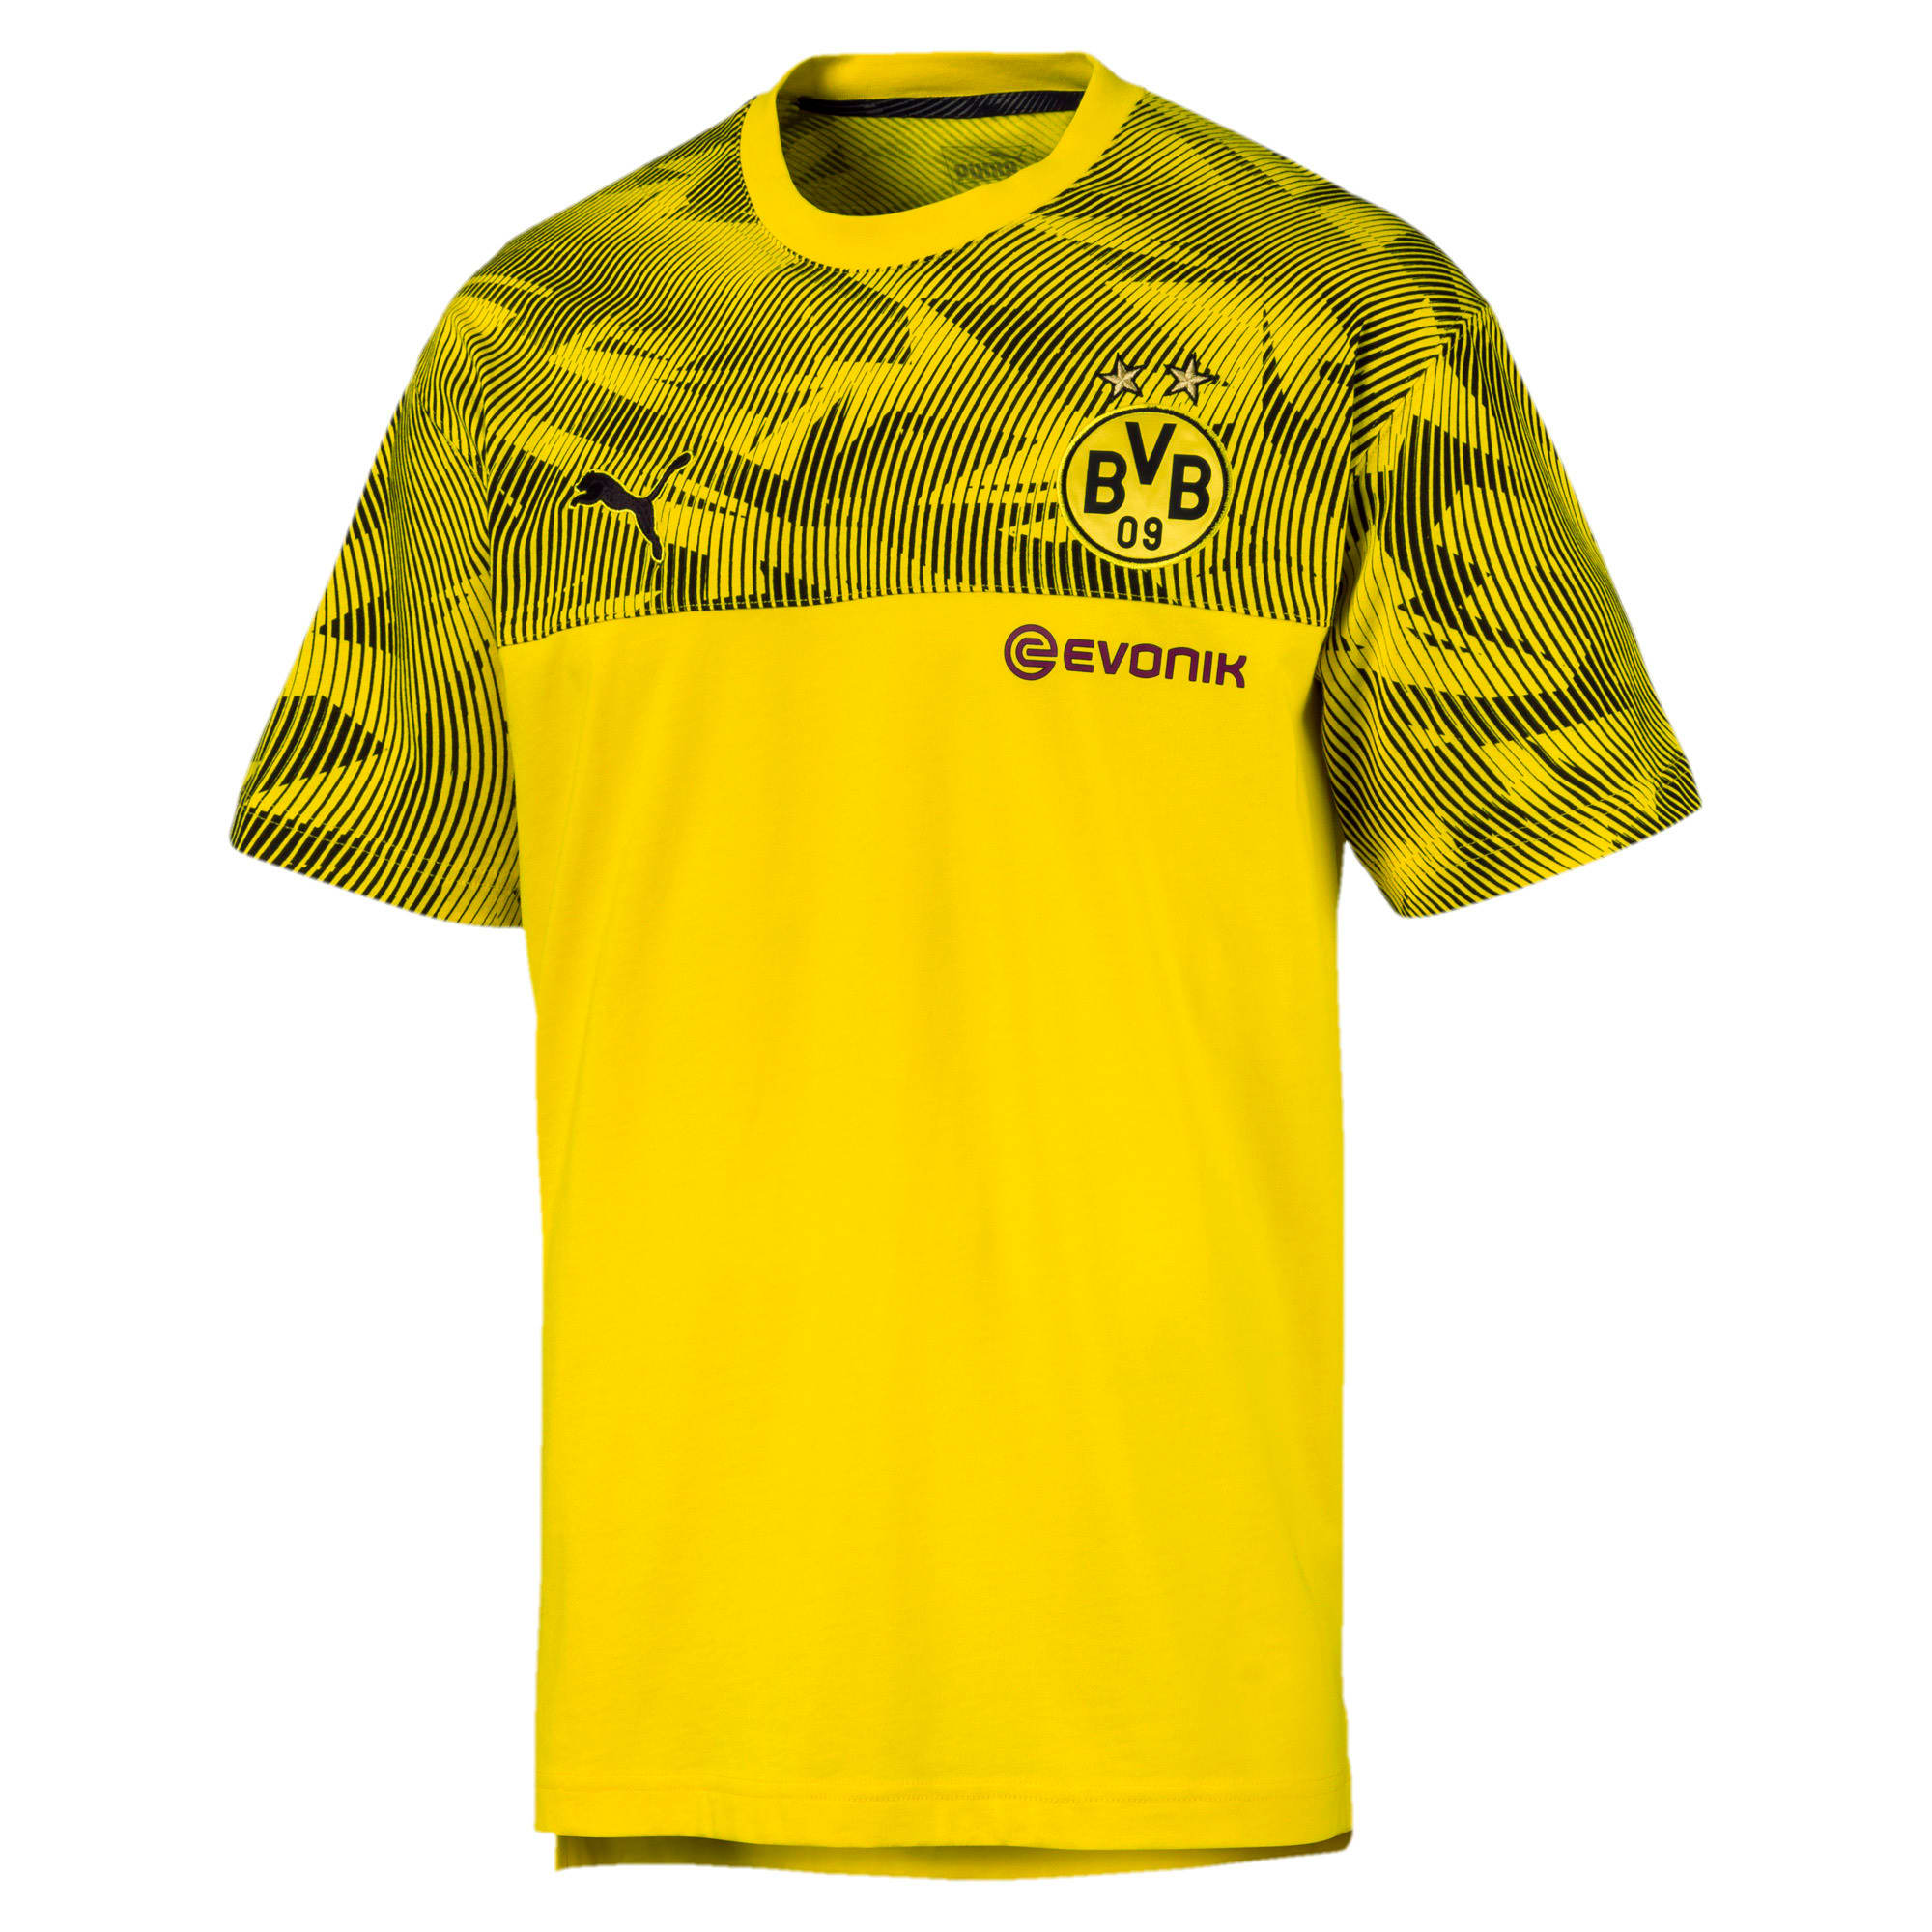 Thumbnail 4 of BVB Casuals Men's Tee, Cyber Yellow-Puma Black, medium